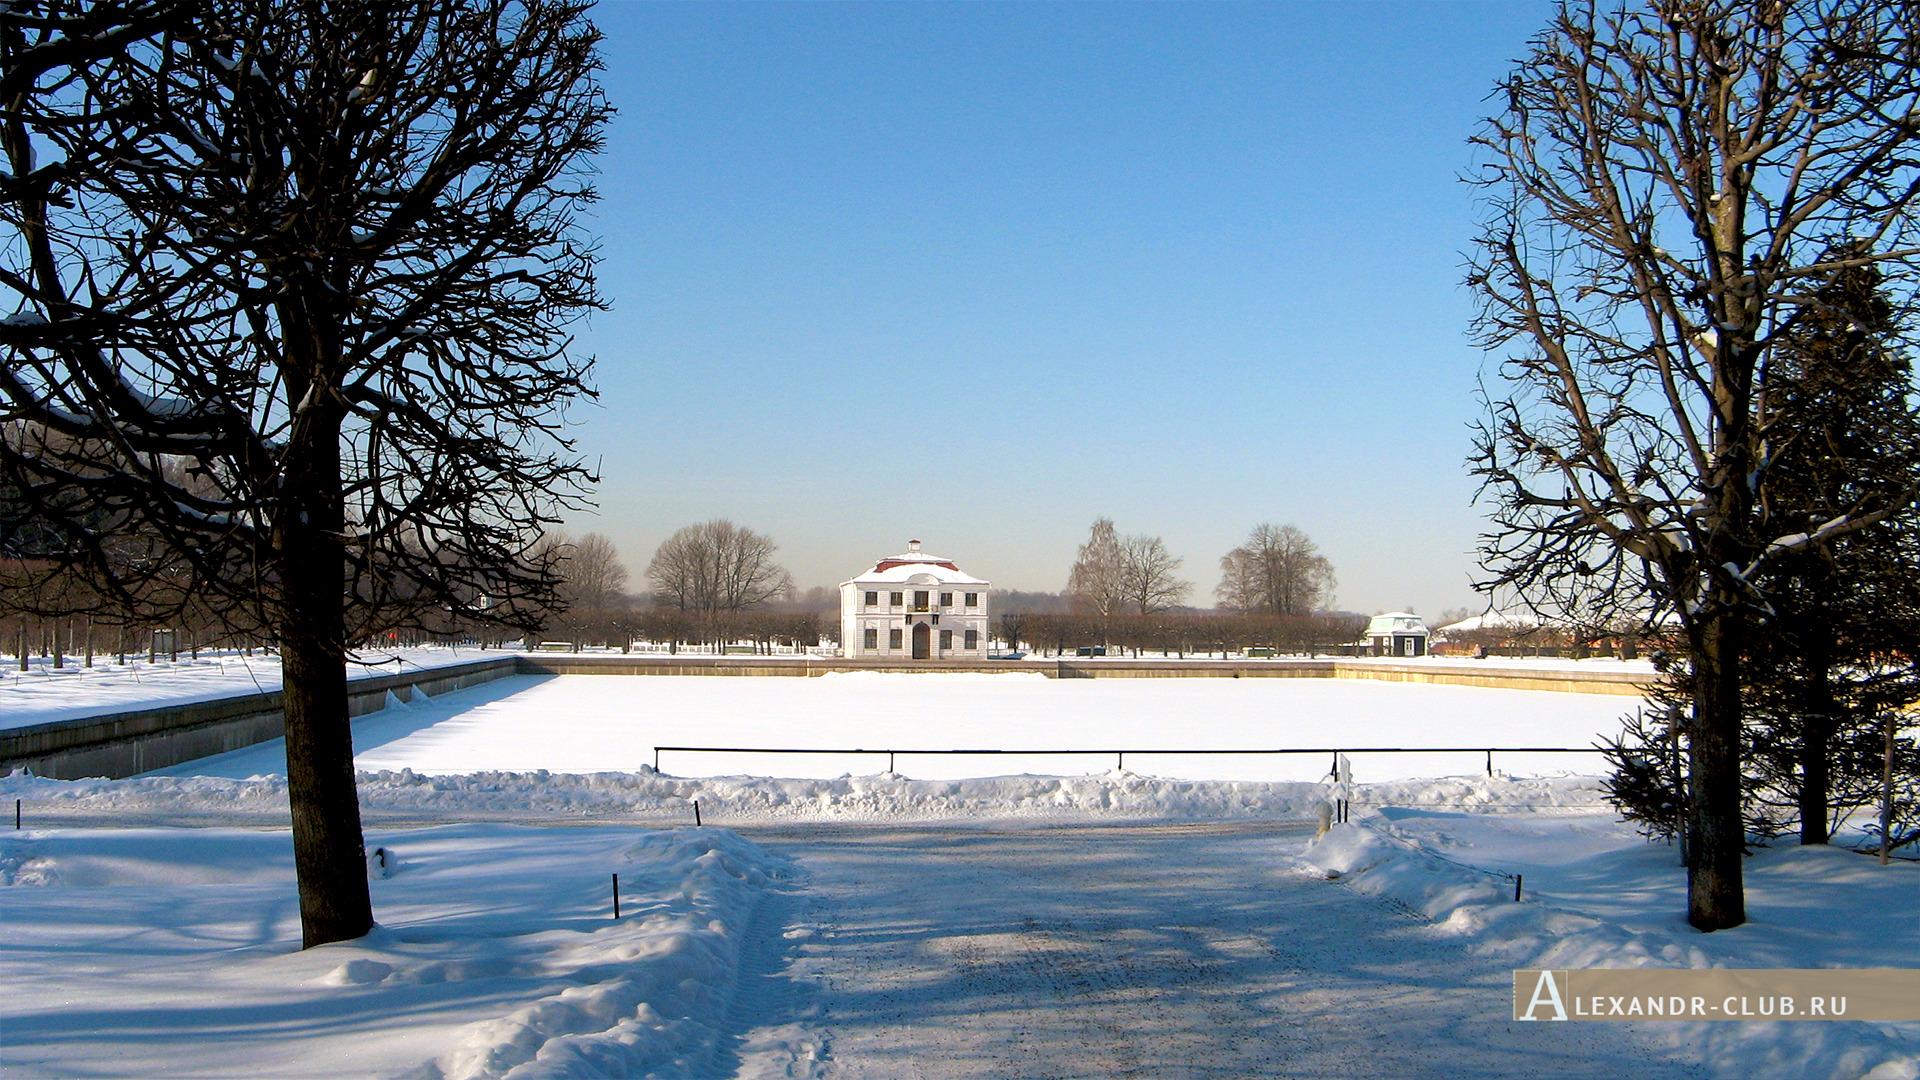 Петергоф, зима, Нижний парк, Марлинский пруд и дворец Марли – 1